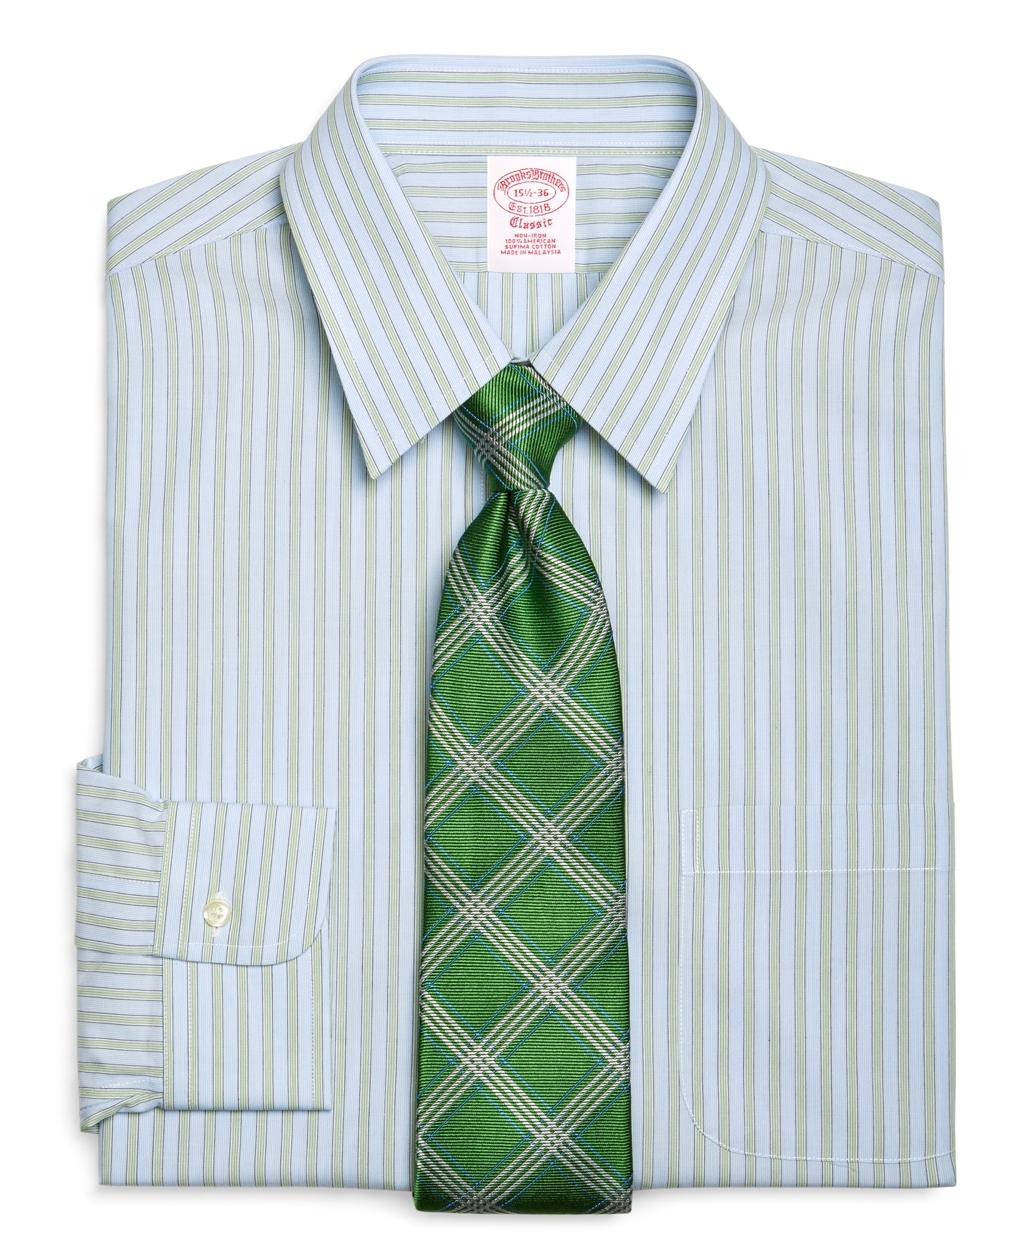 Lyst brooks brothers supima cotton noniron slim fit for Supima cotton dress shirts